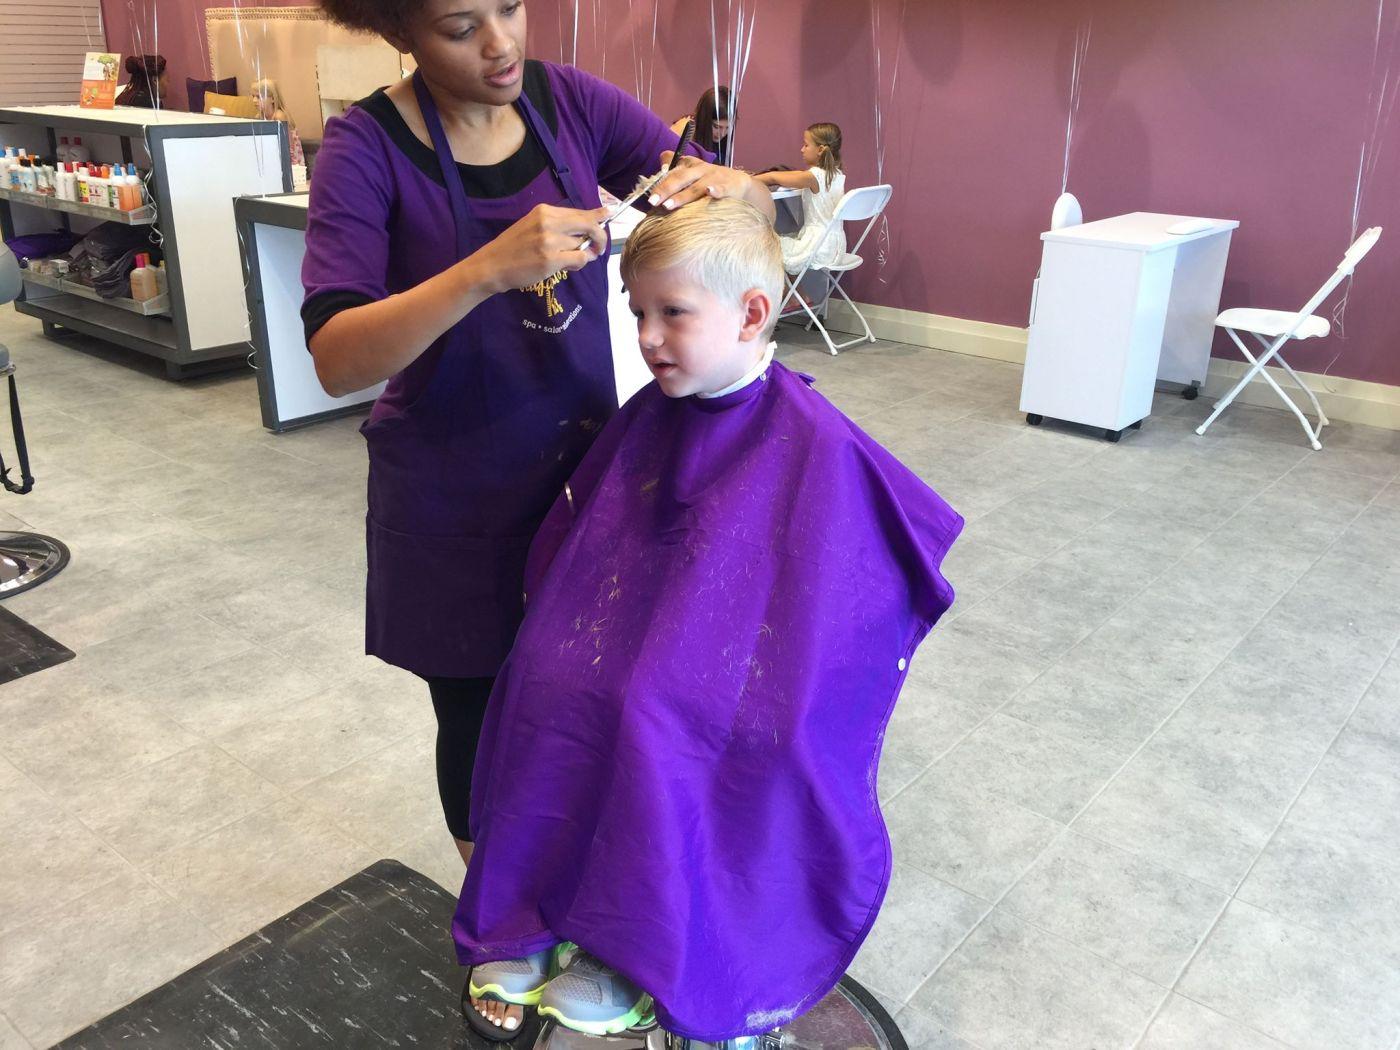 Birmingham, Sugar Plum Kids, hair cuts, salons, kids salons